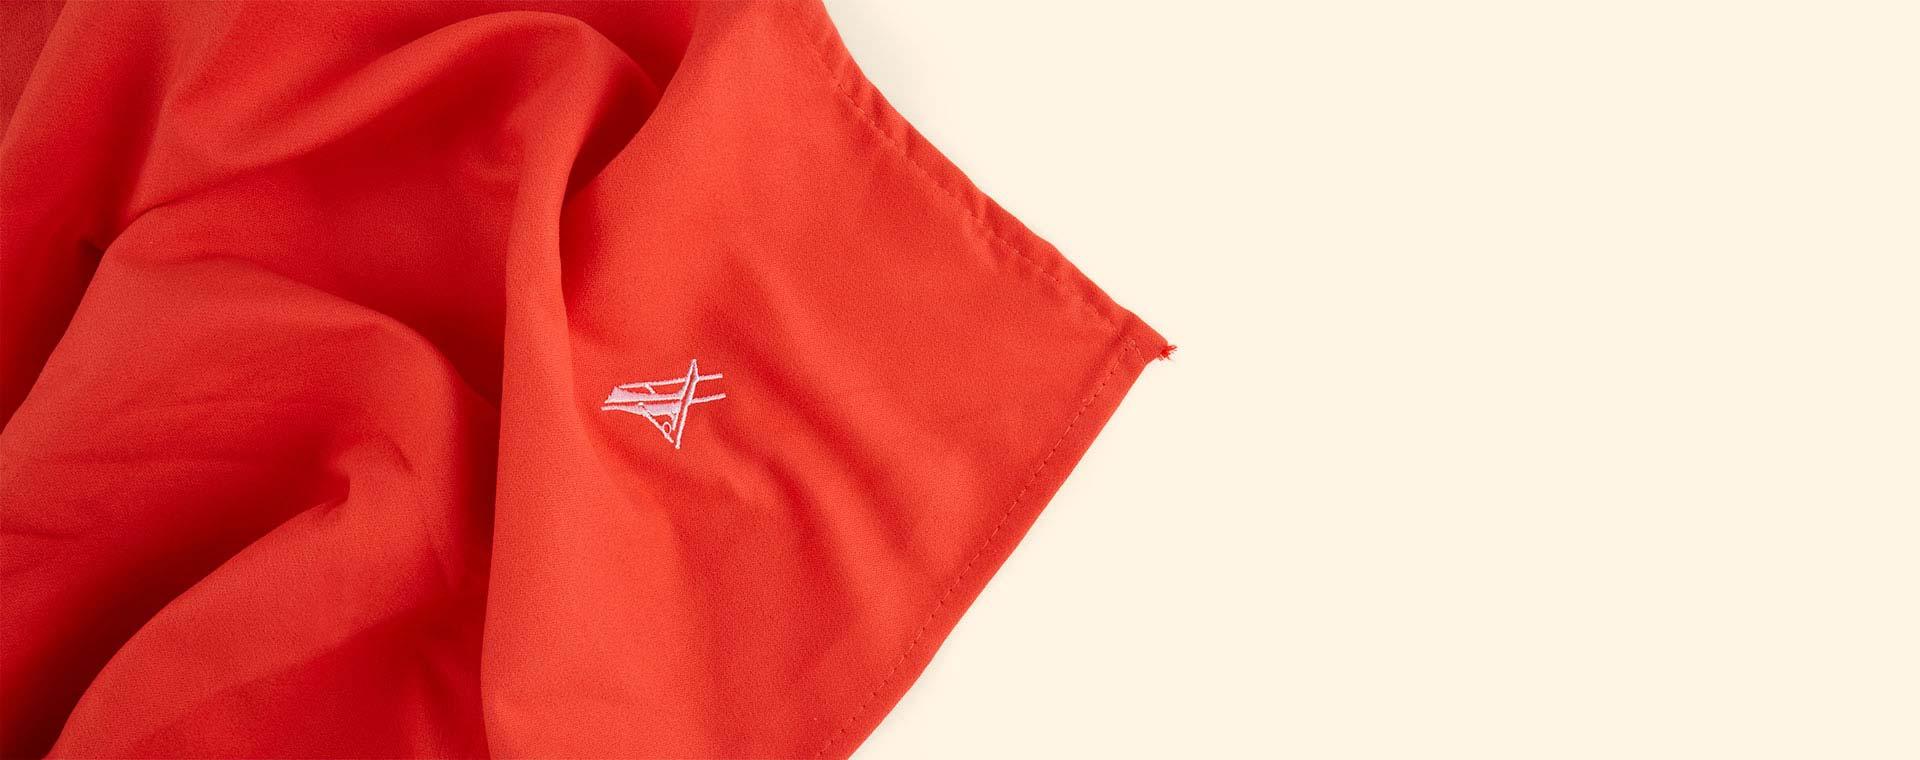 Red Dock & Bay Towel